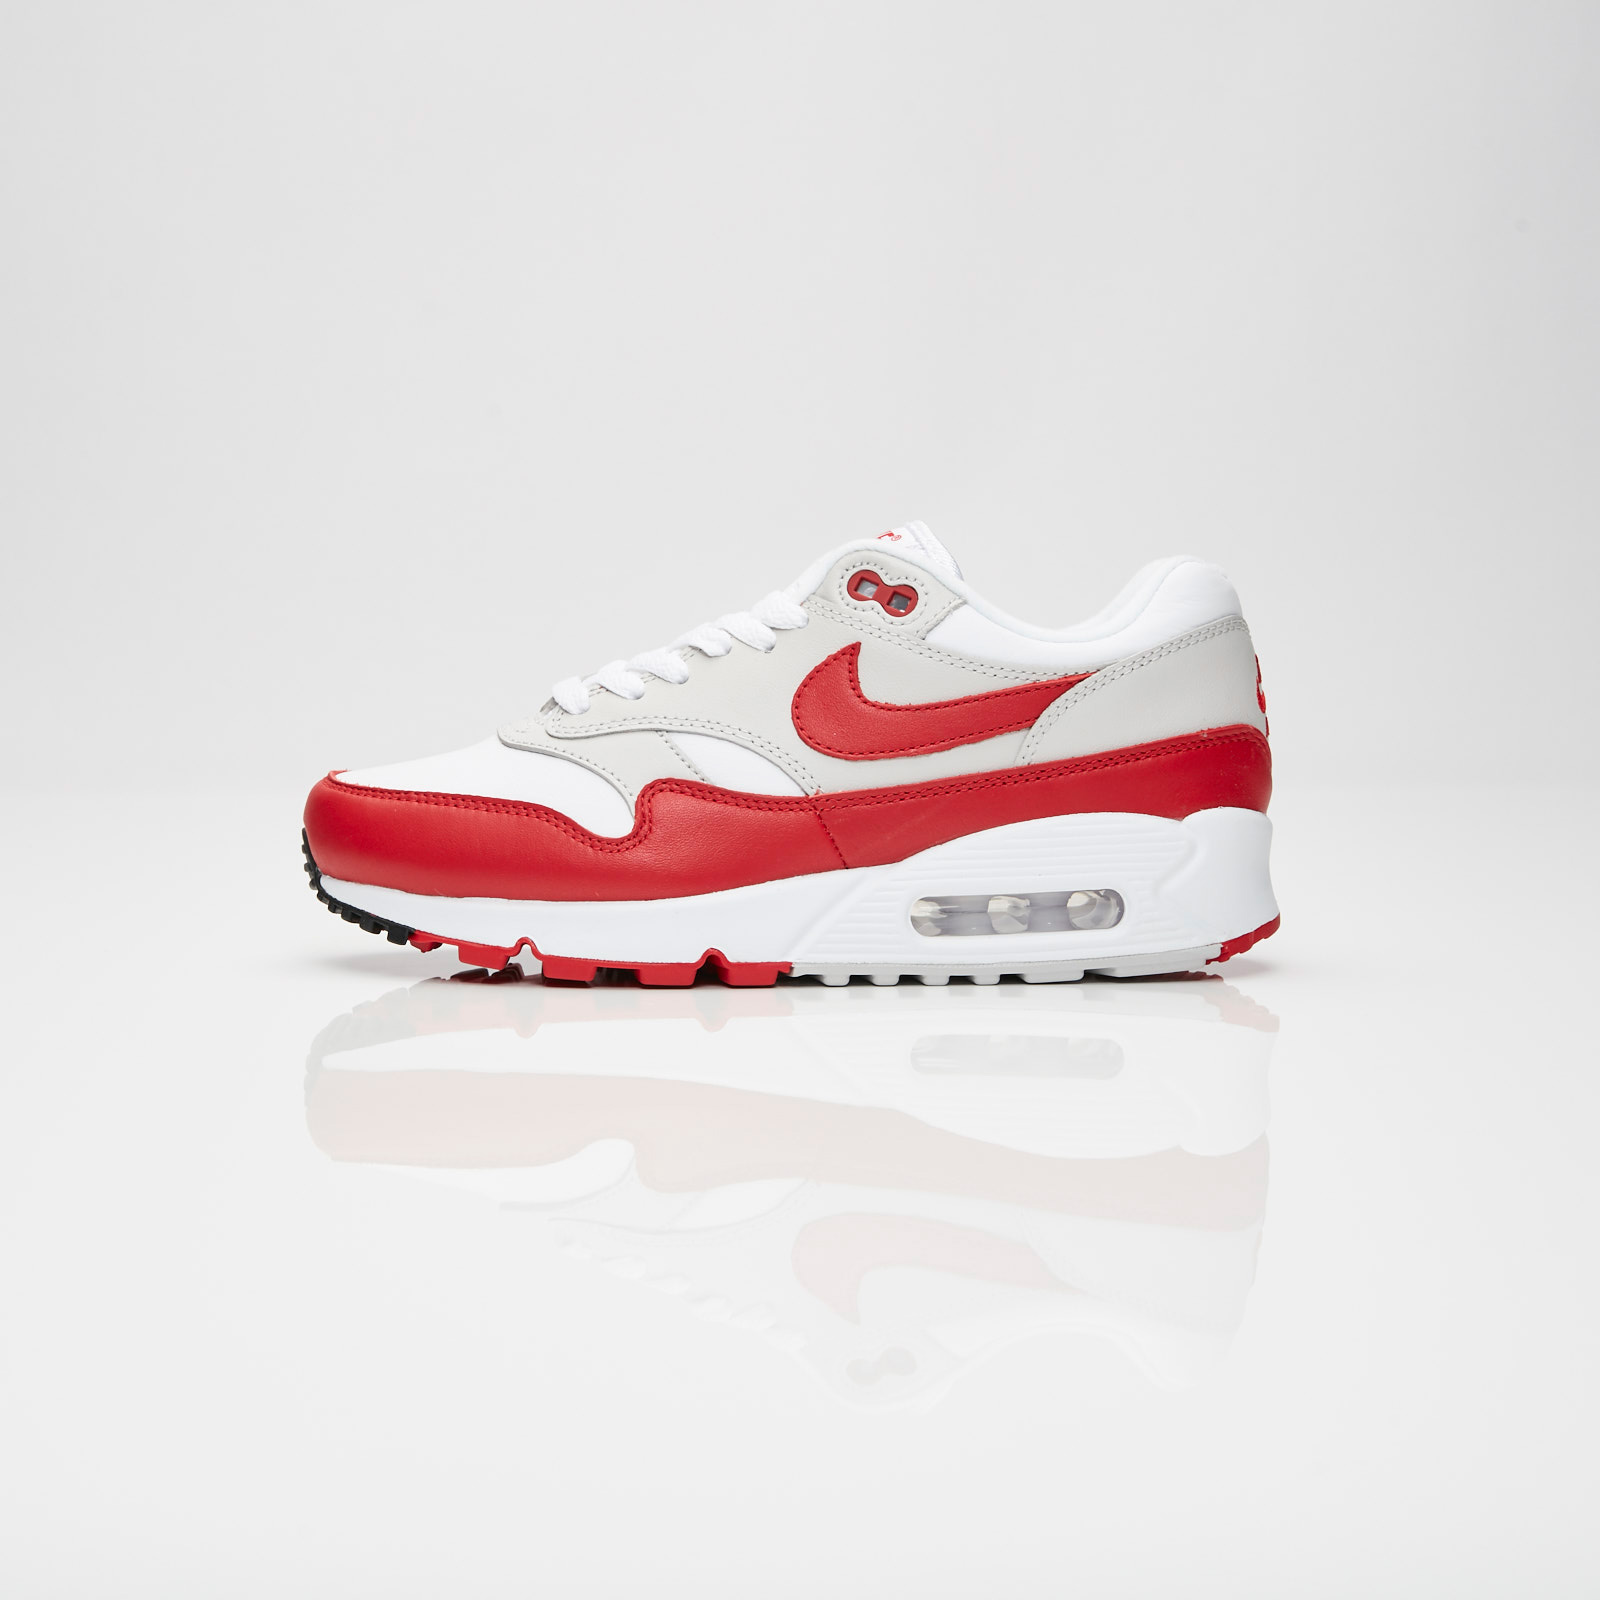 the latest 2bfc2 9d283 Nike Wmns Air Max 90 1 - Aq1273-100 - Sneakersnstuff   sneakers    streetwear online since 1999